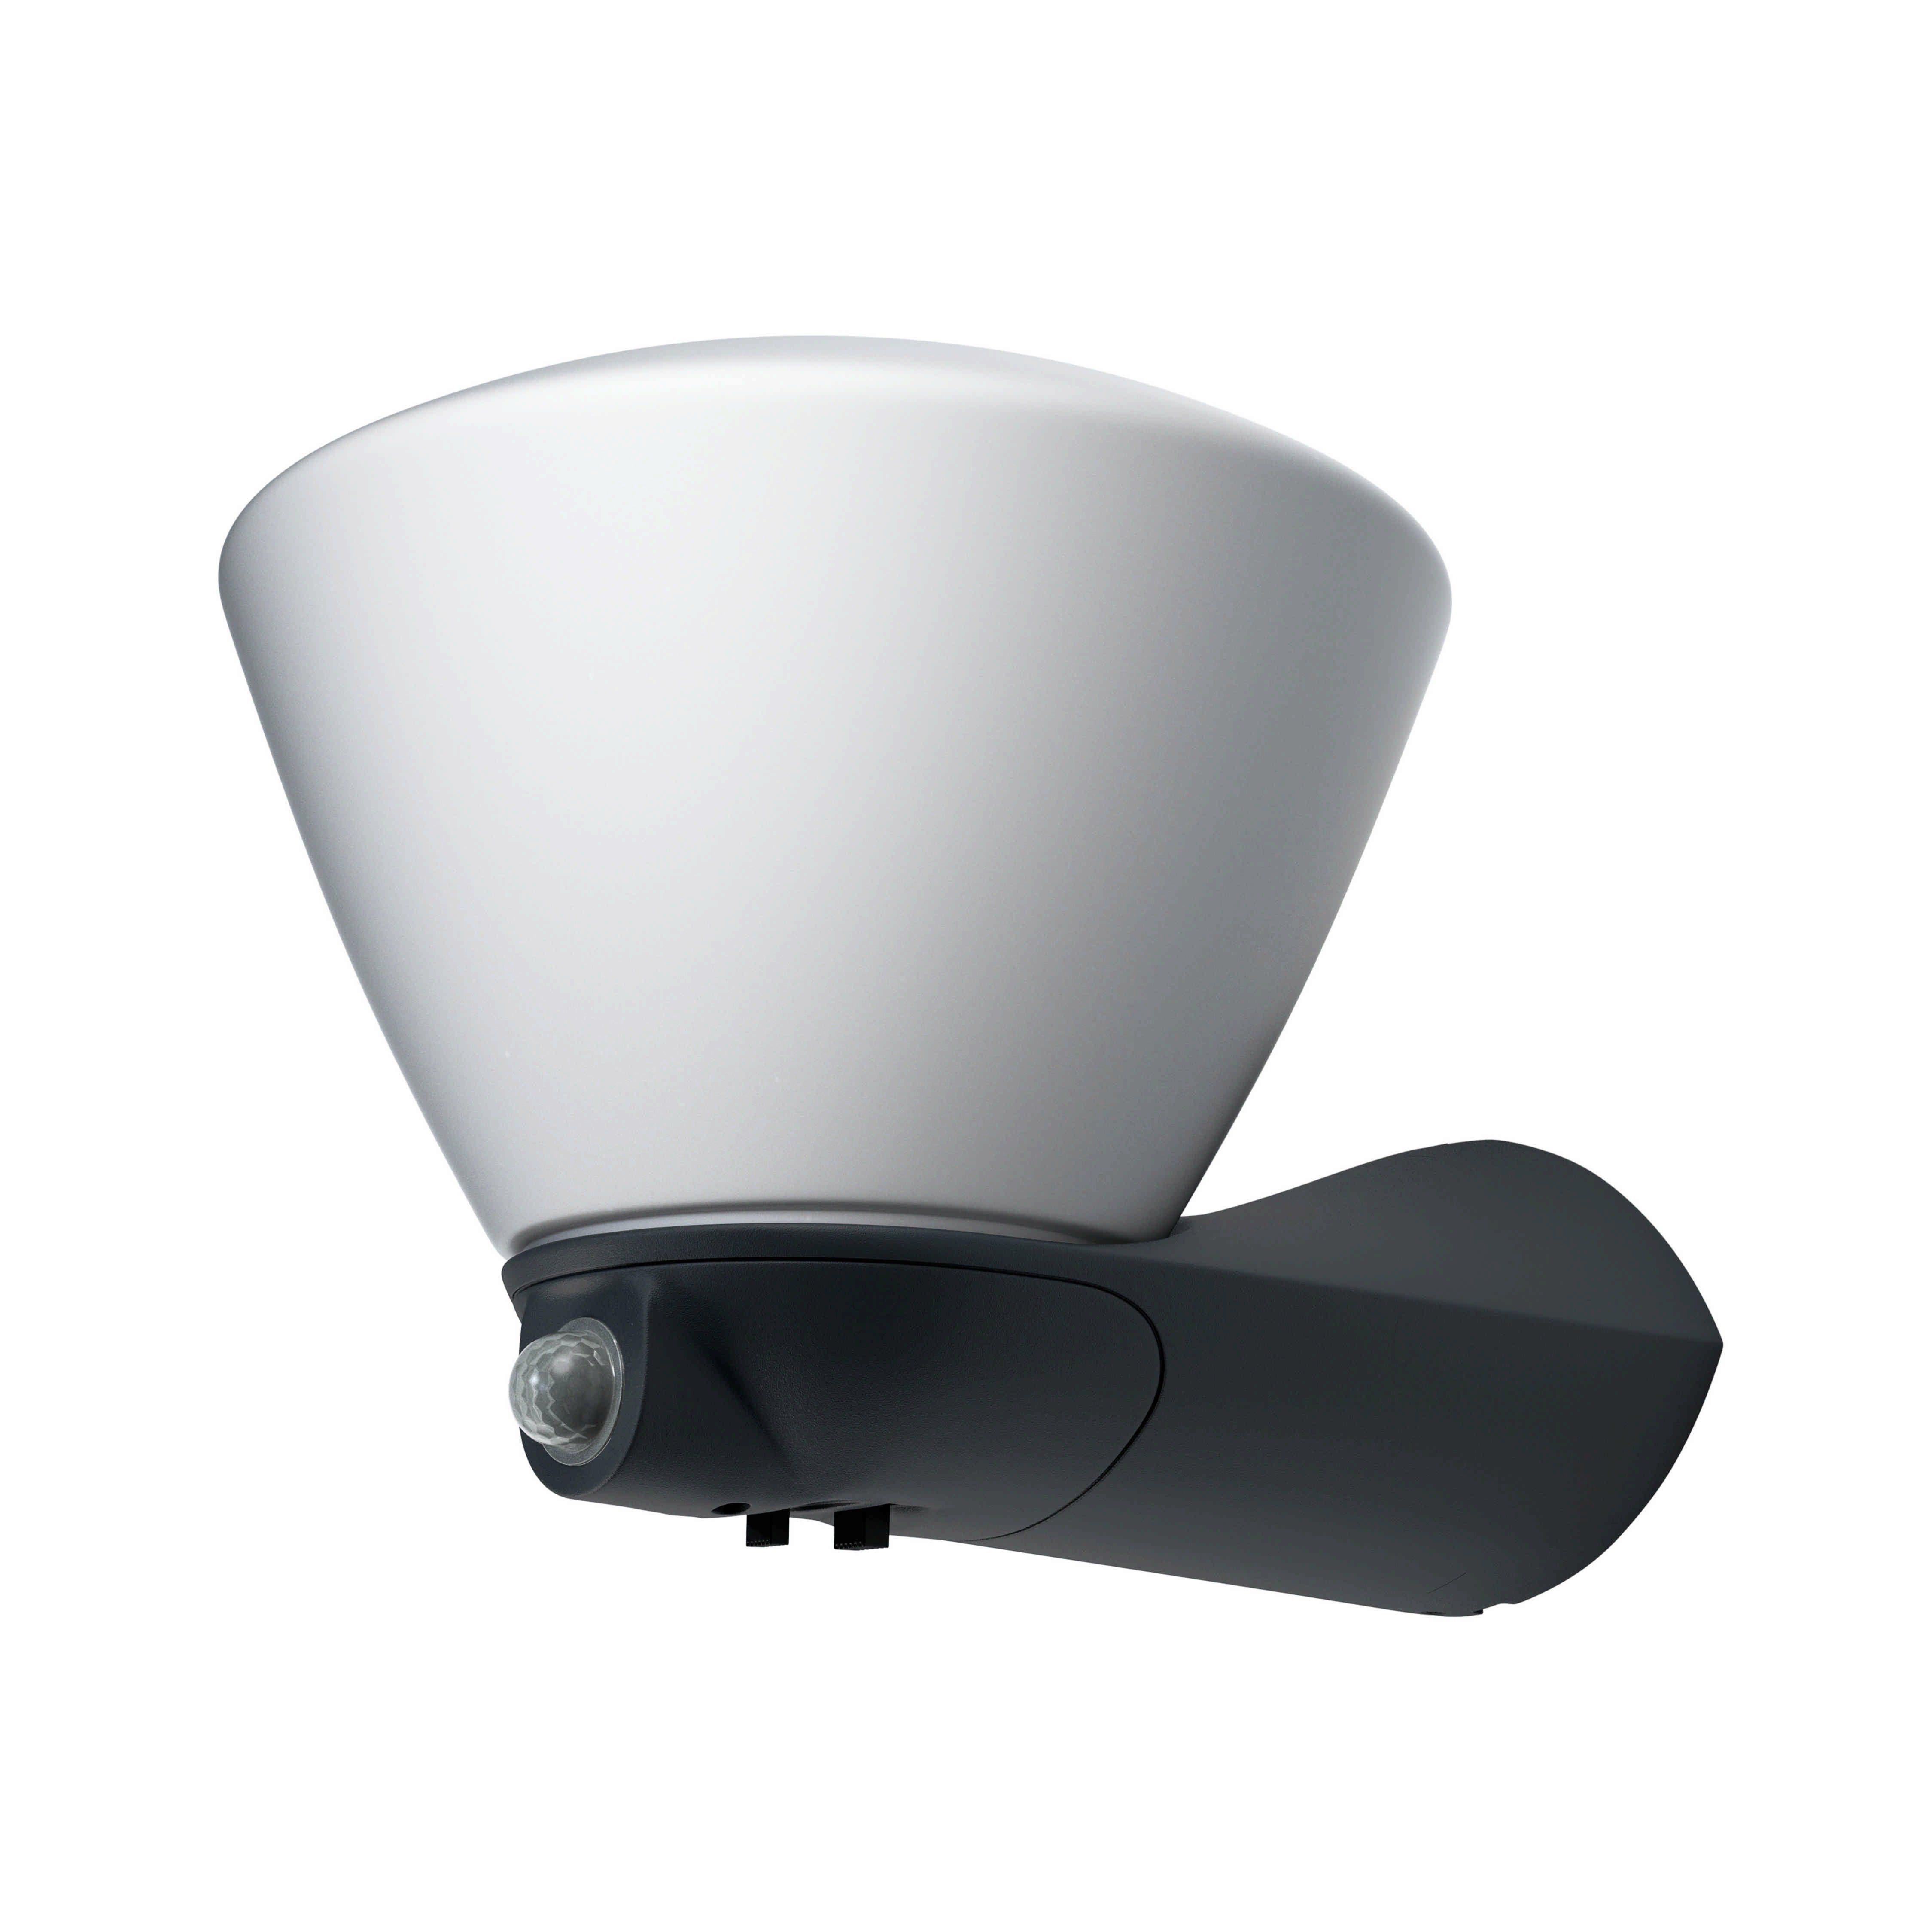 Osram LED-Wandleuchte mit integriertem Bewegungsmelder »ENDURA STYLE Lantern Bowl Sensor«